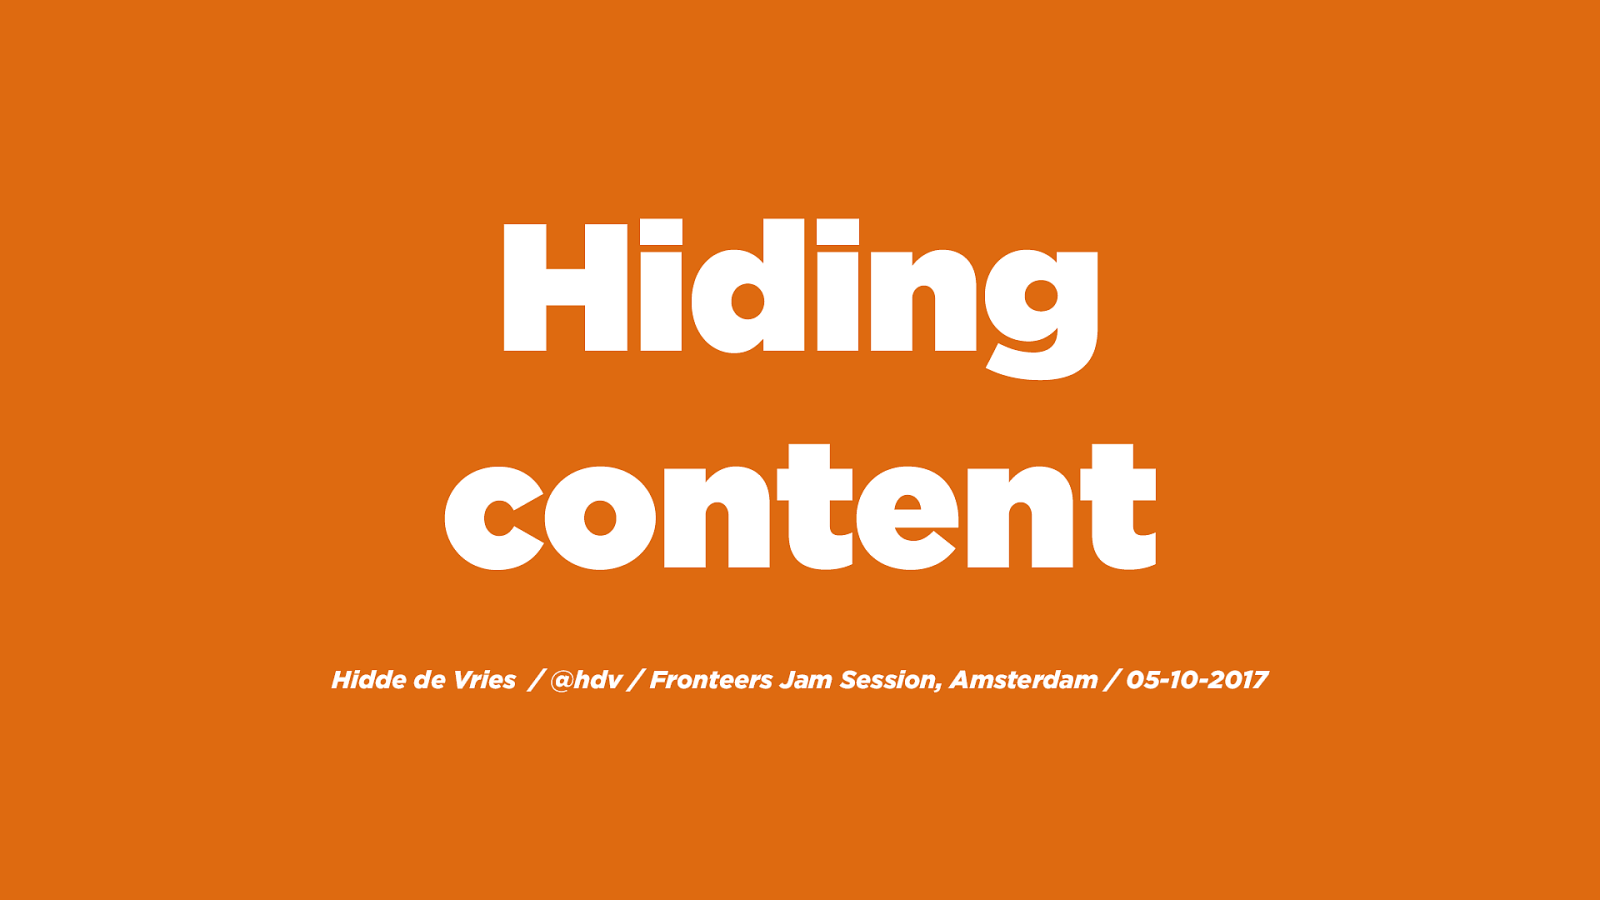 Hiding content